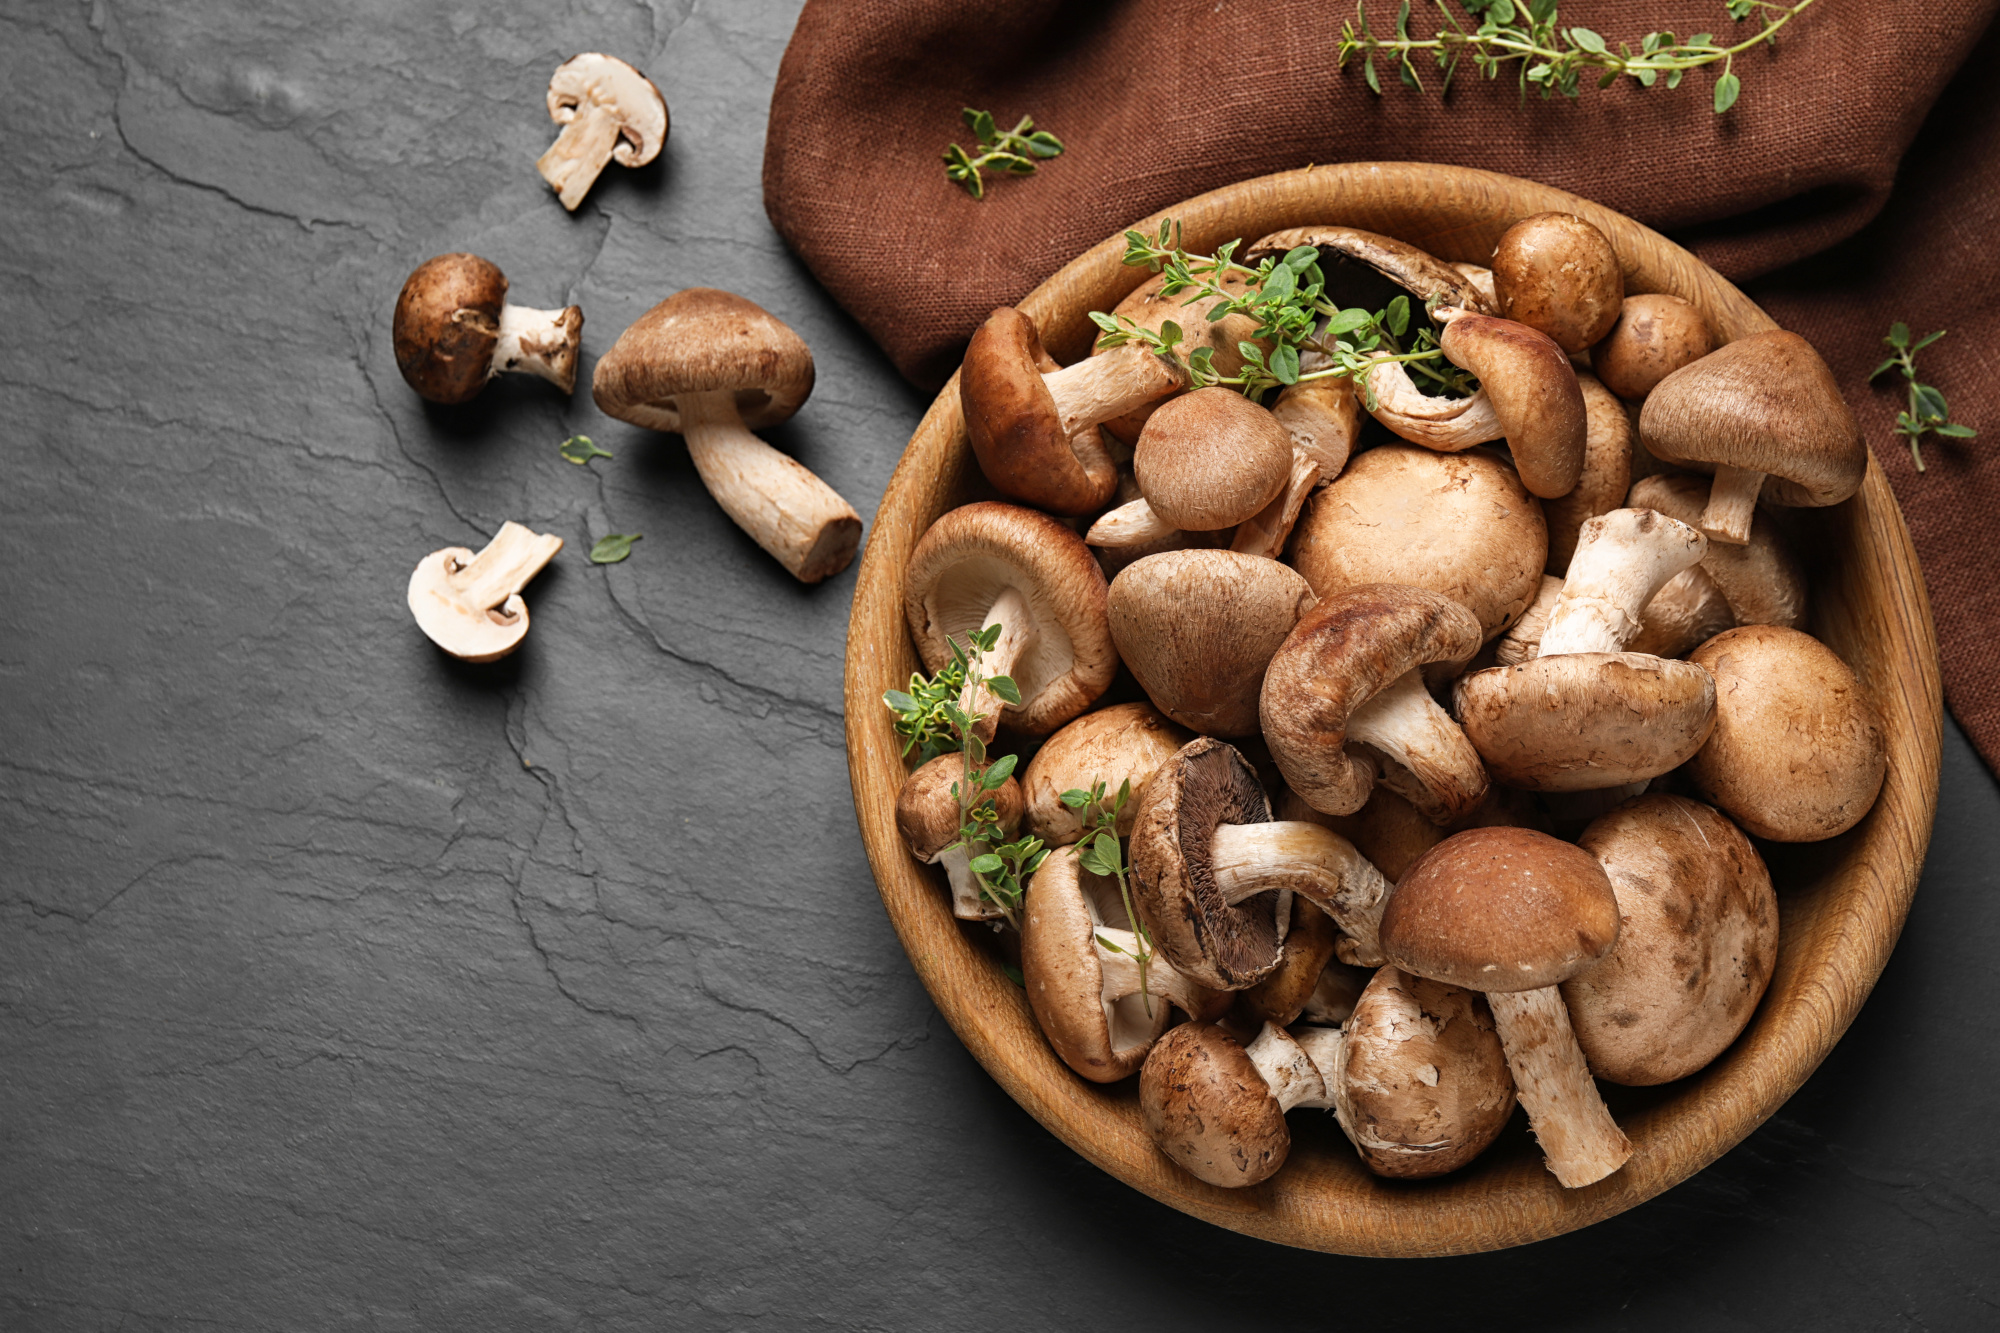 Veggie of the month - Mushrooms